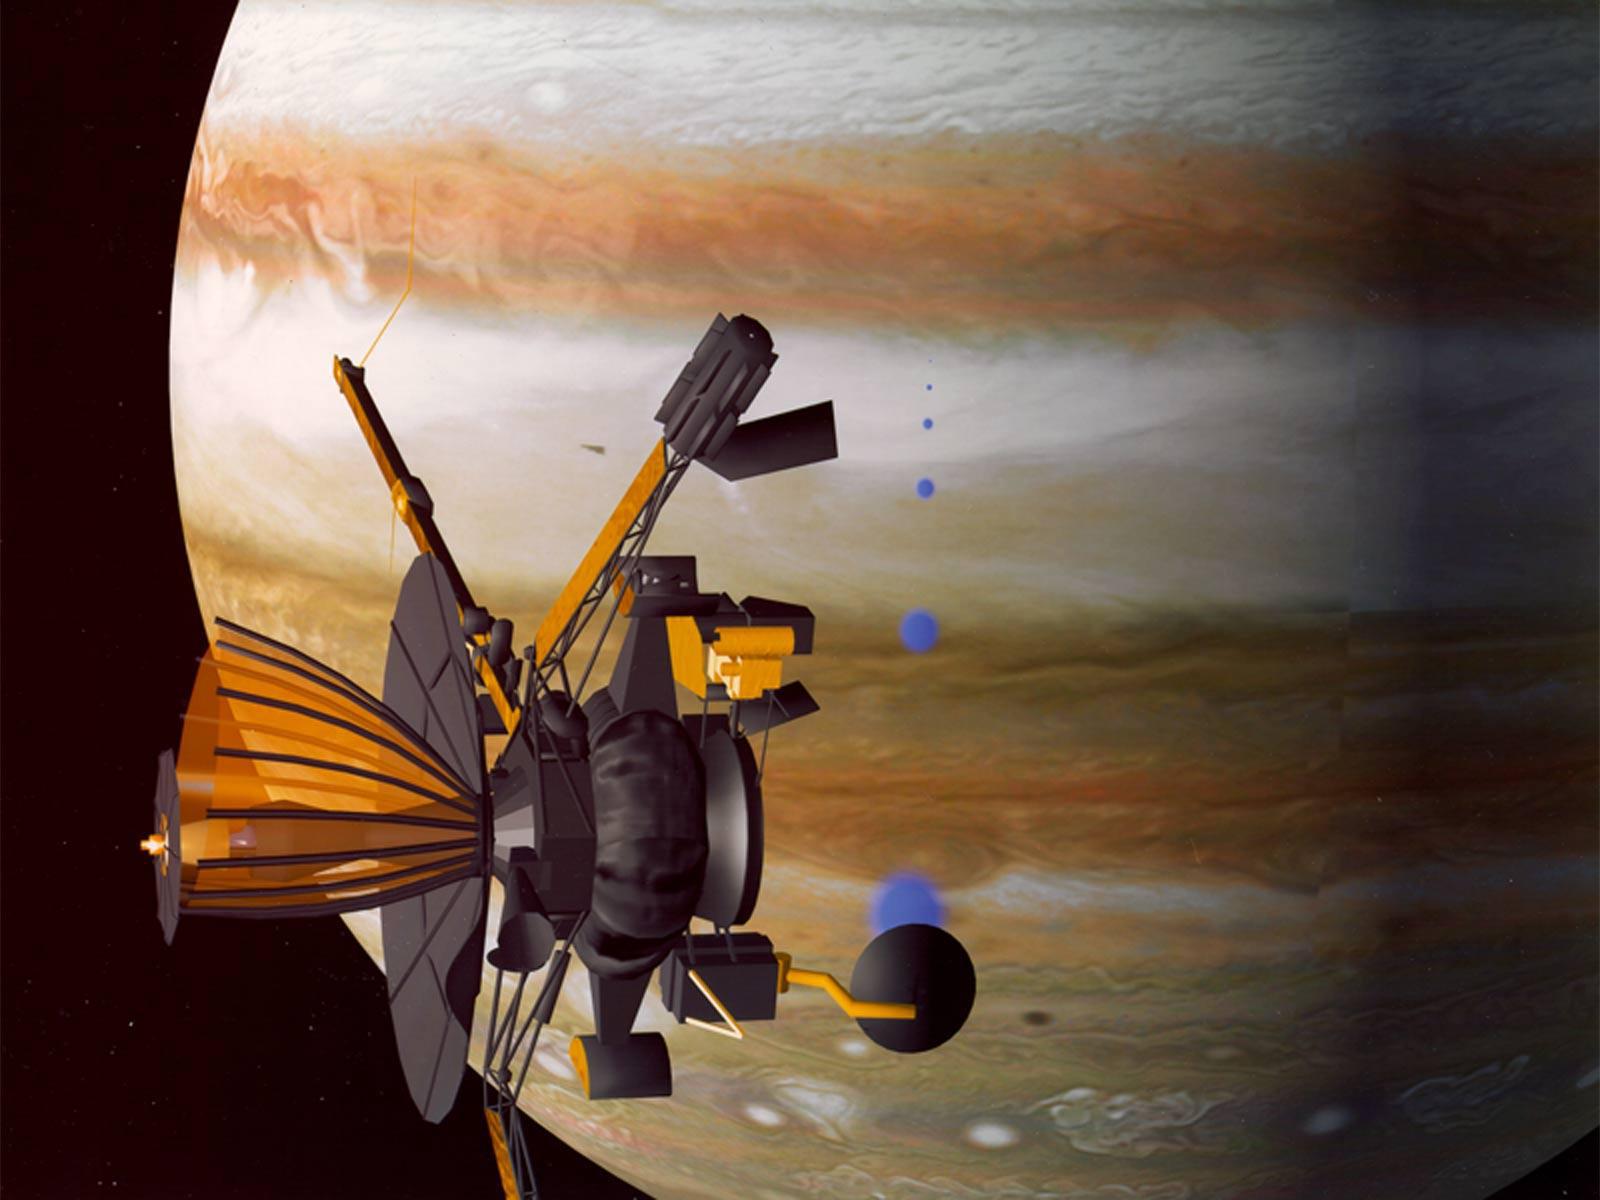 nasa galileo spacecraft - 962×728